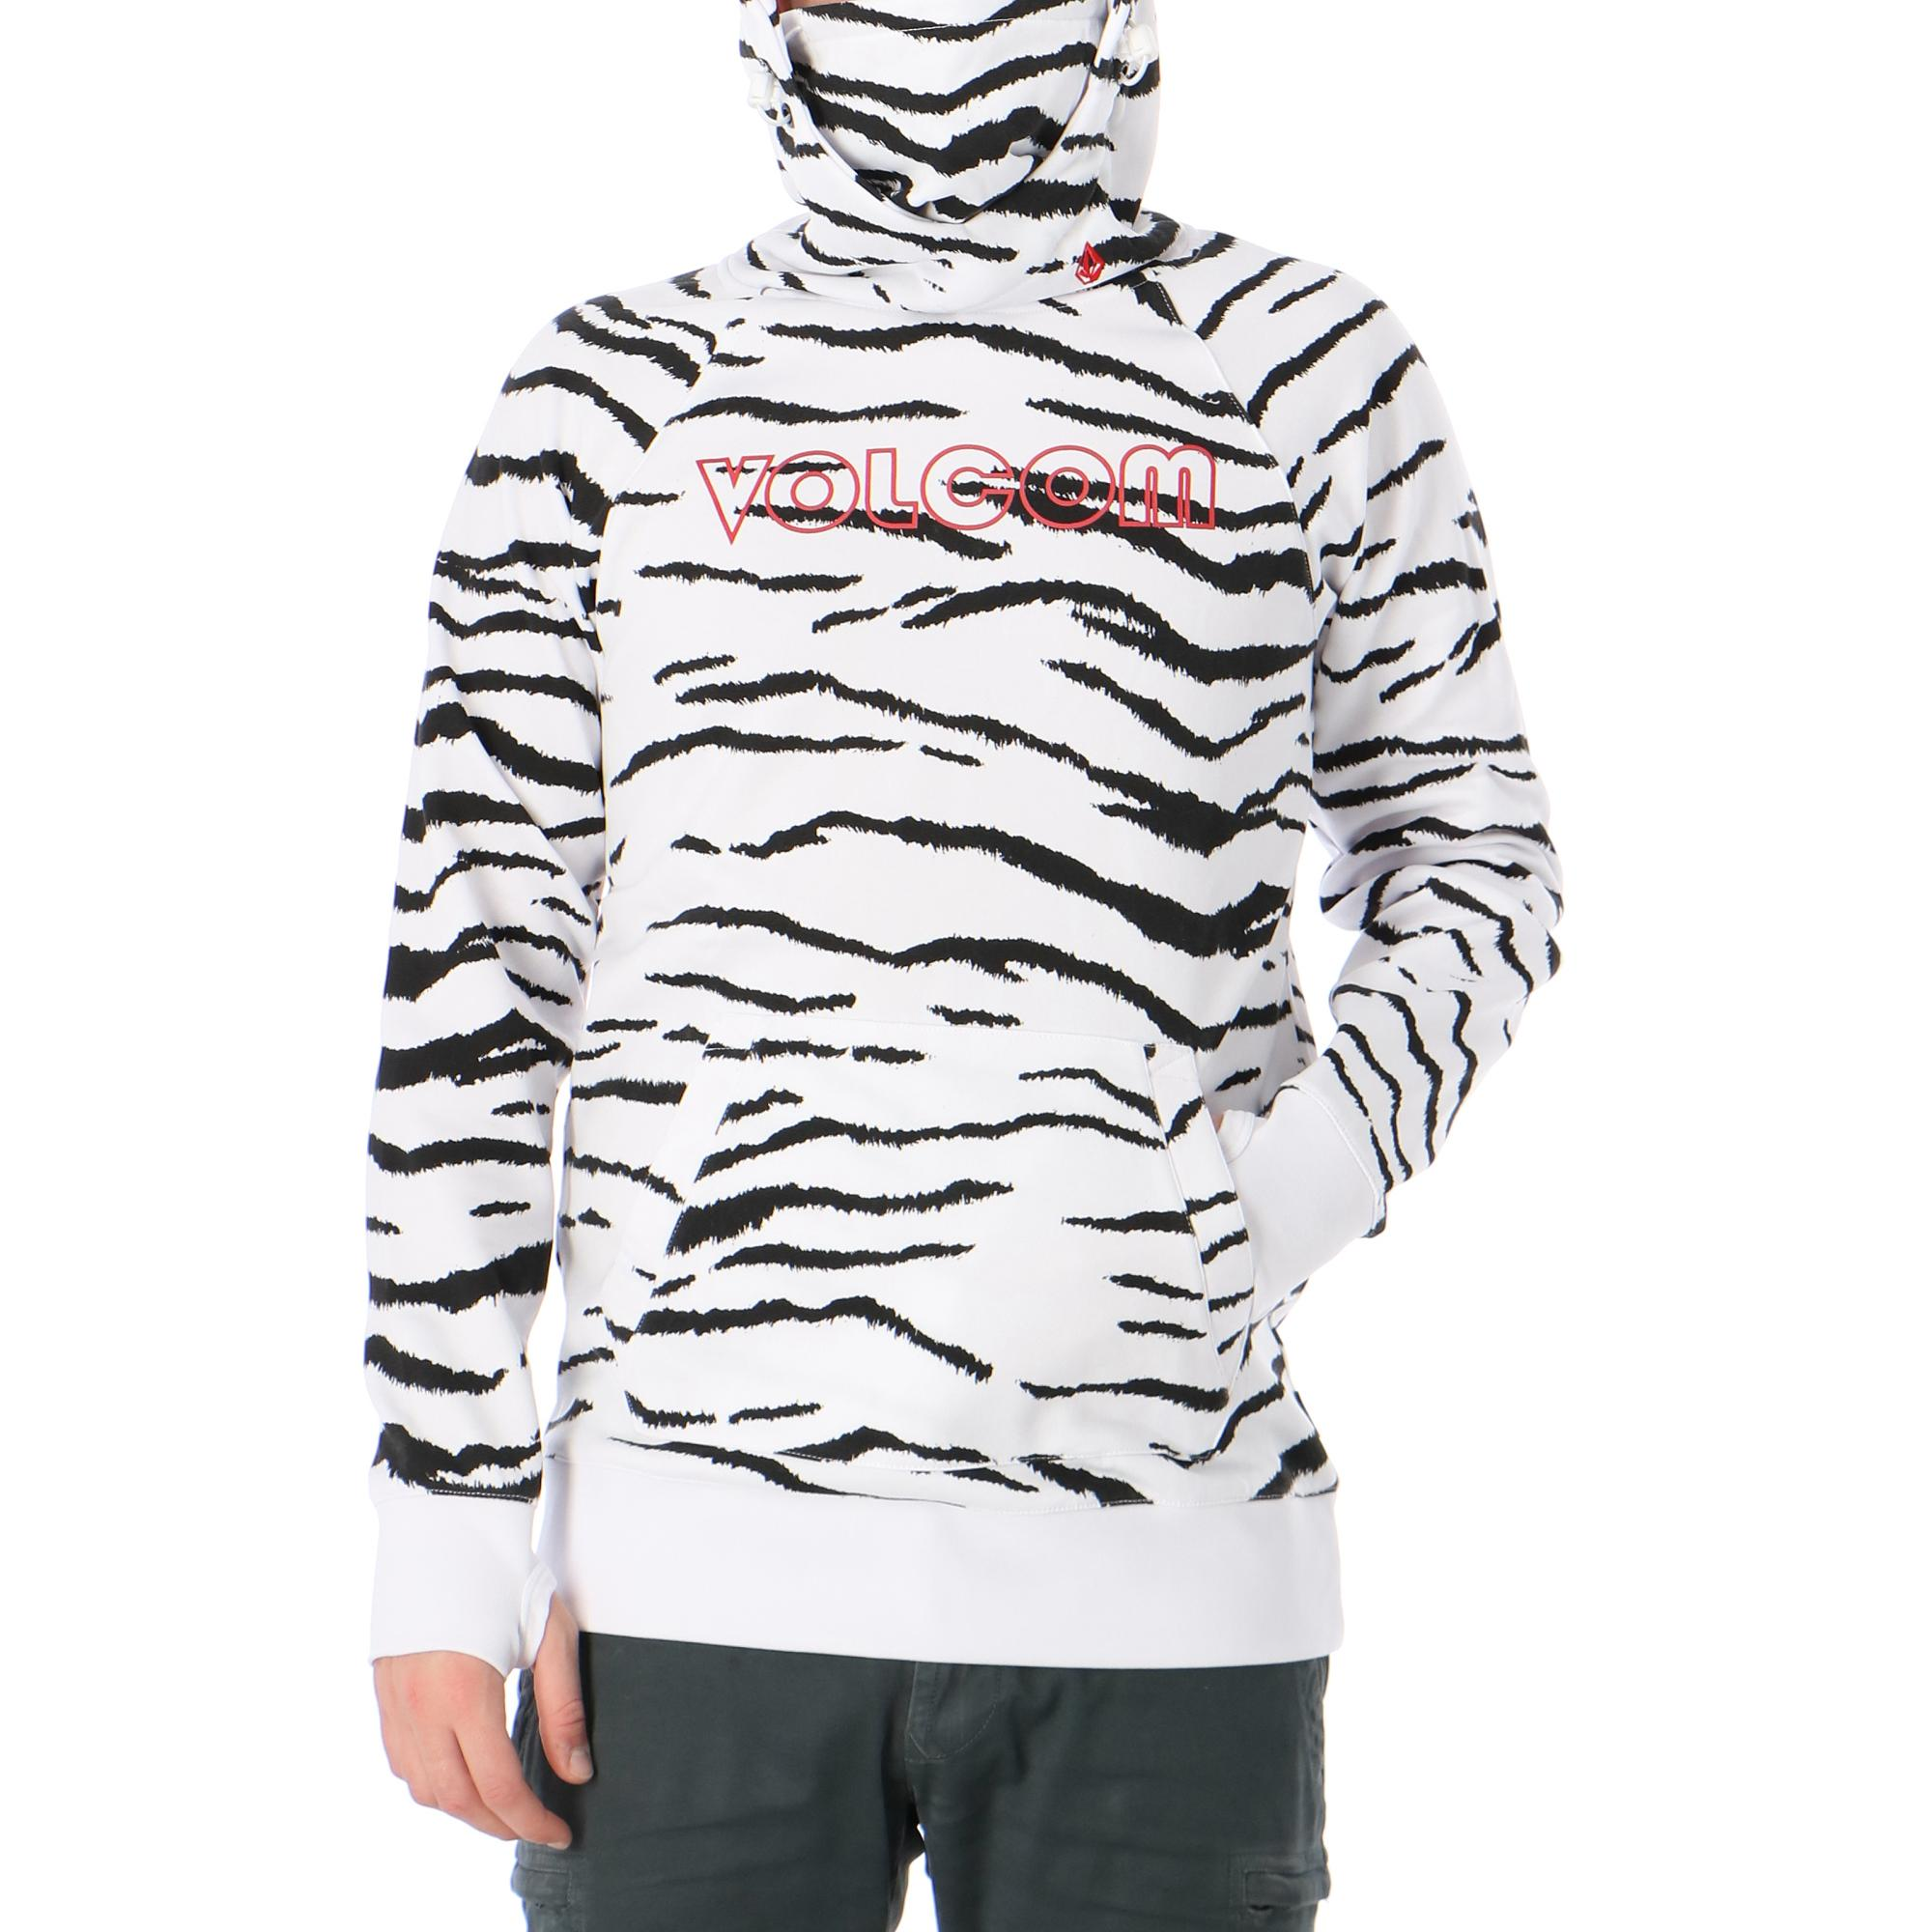 Volcom Hydro Riding Hoodie White tiger